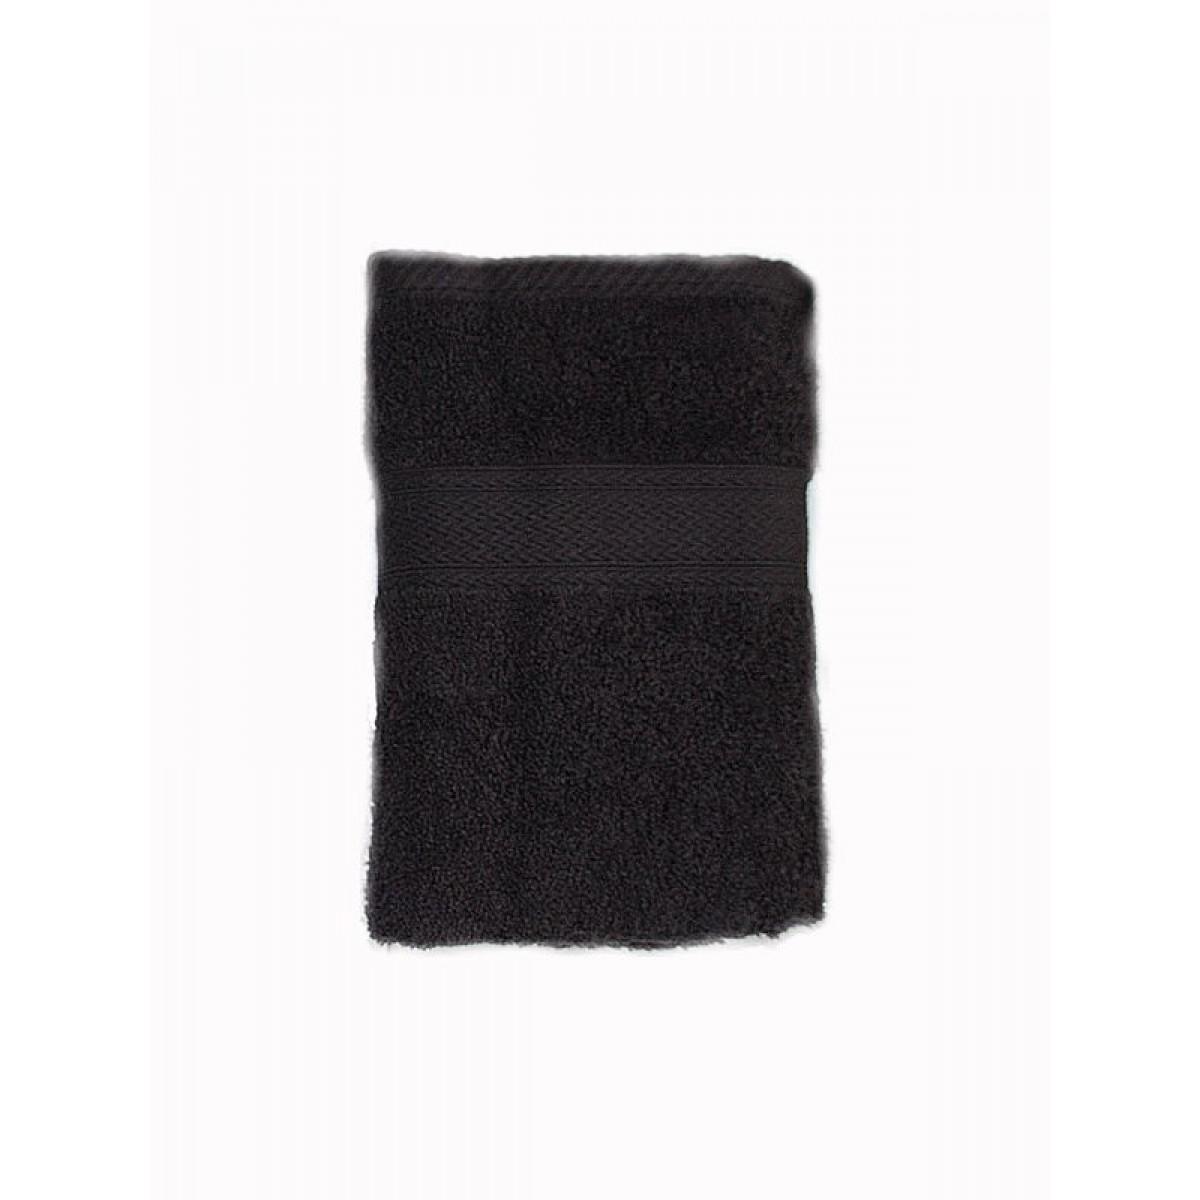 CONZEPT Håndklæde 50 x 100 cm. sort